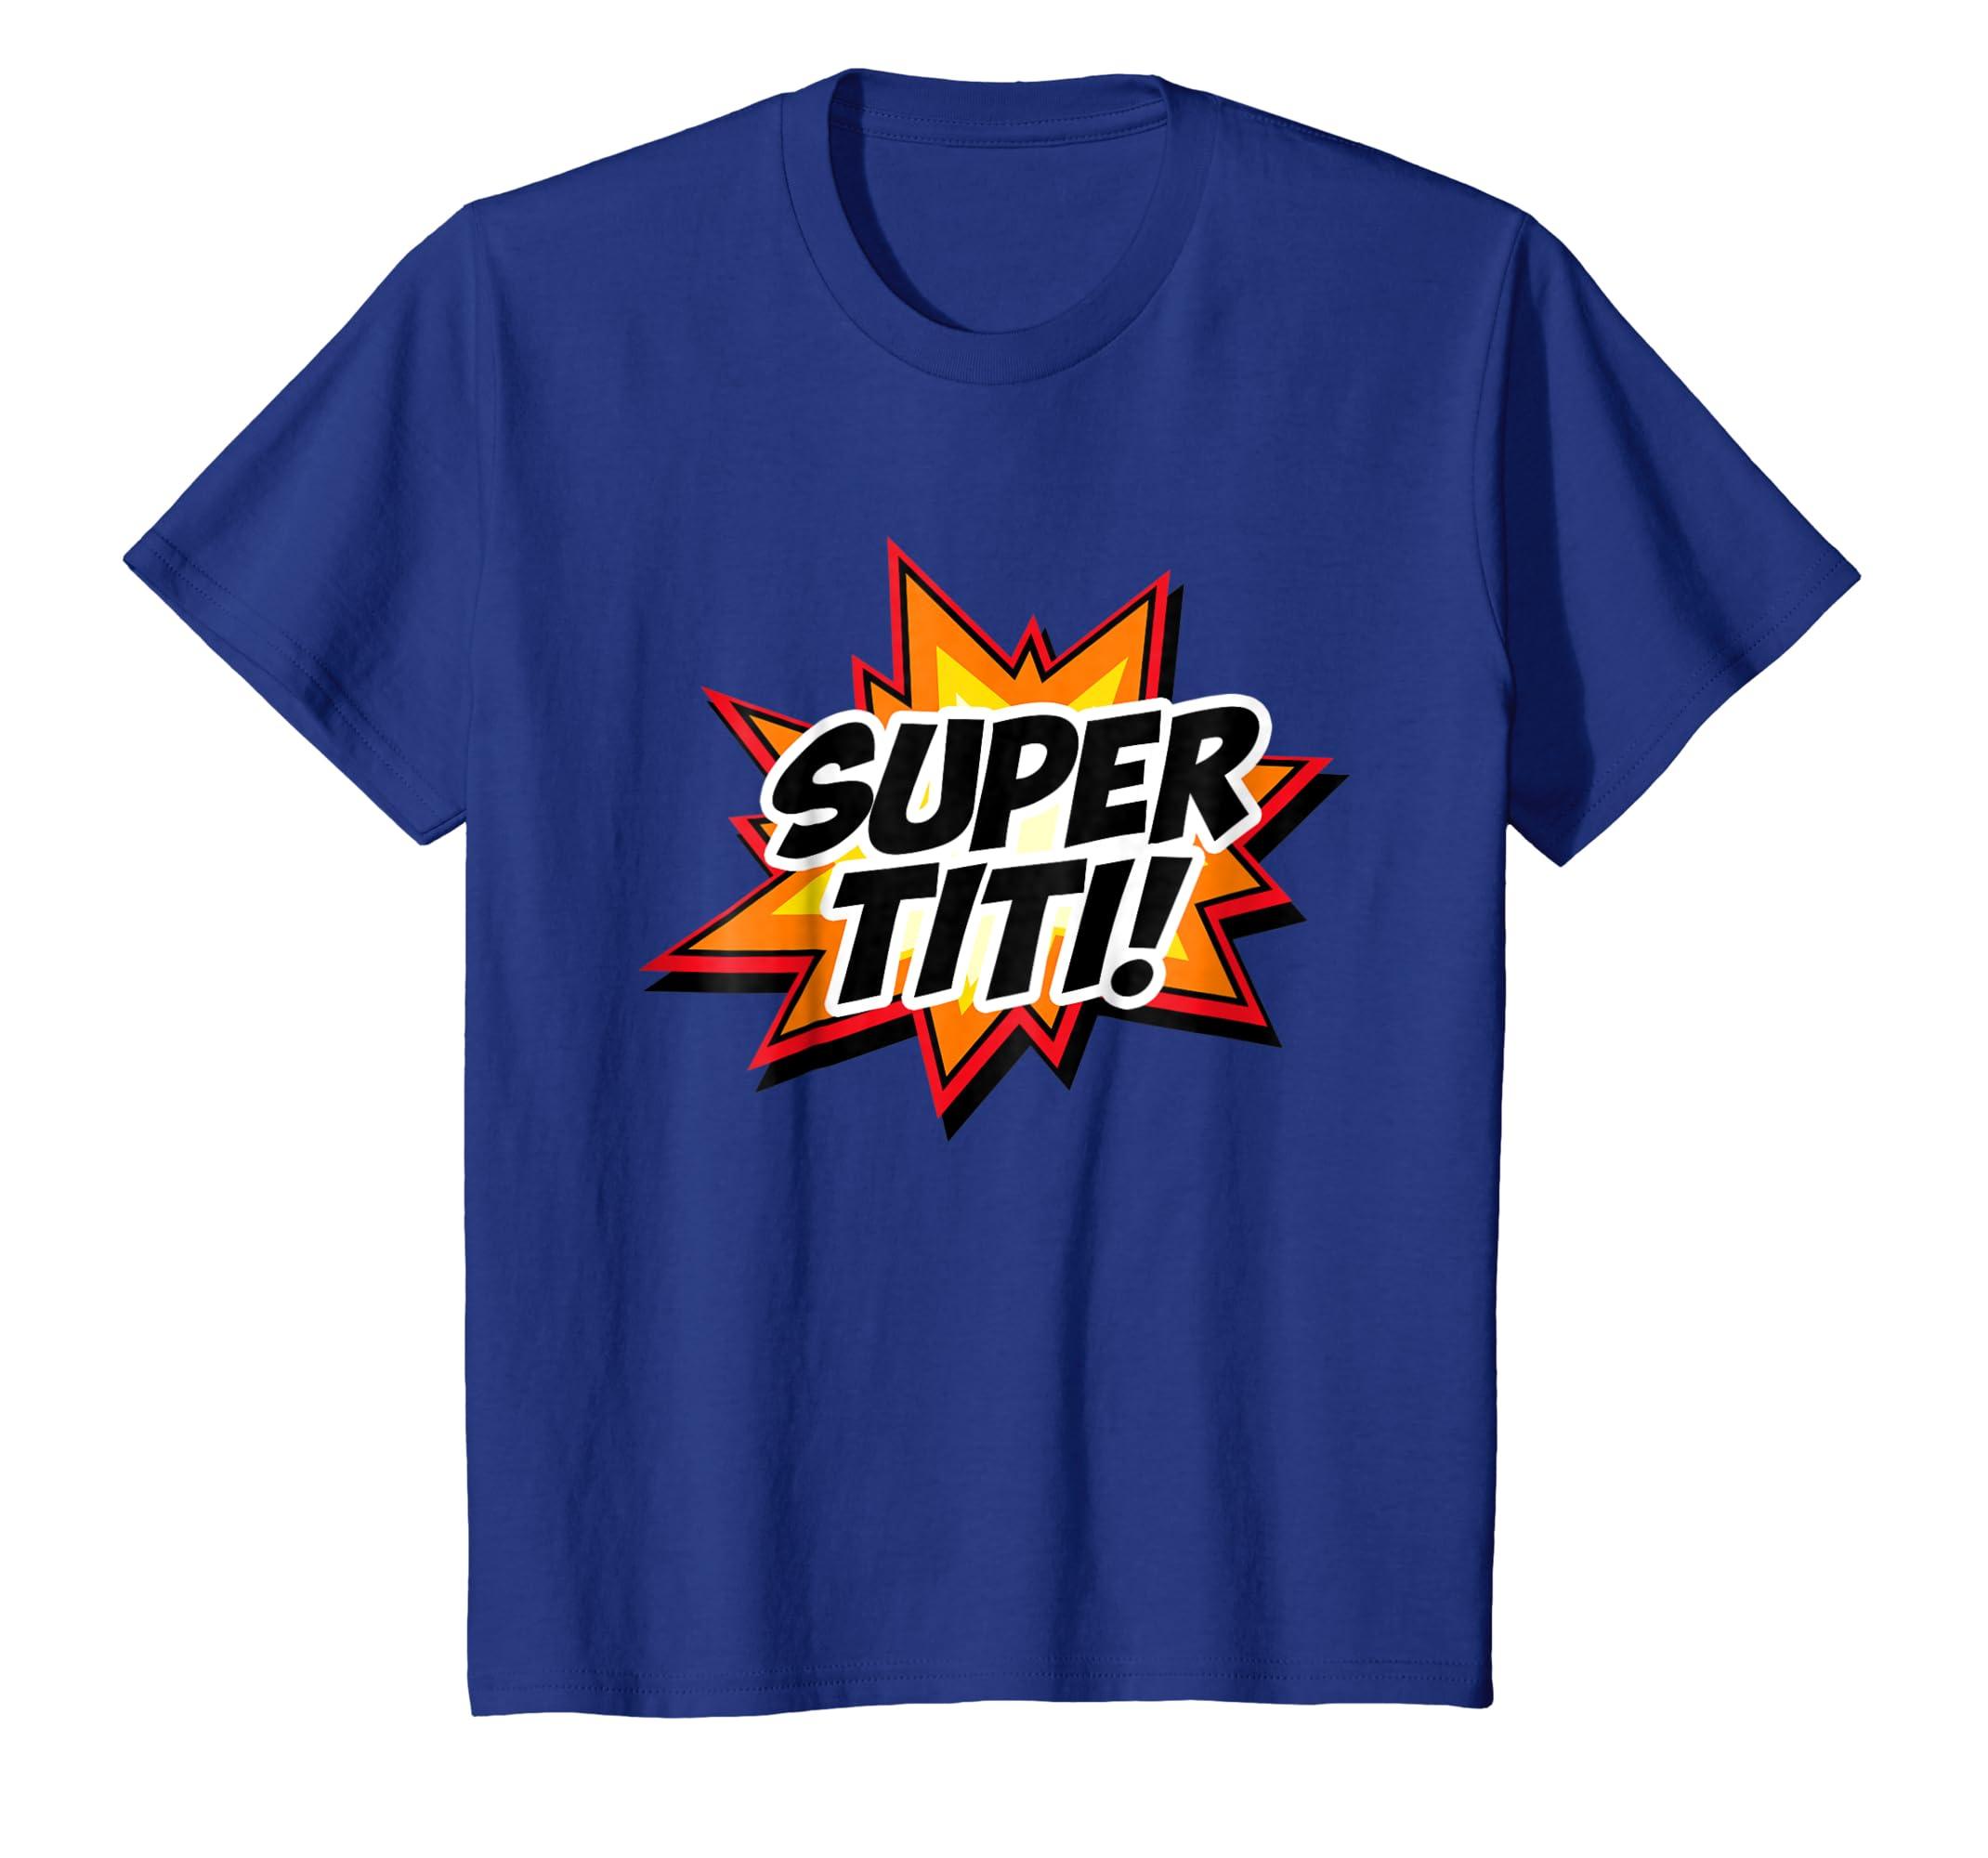 Amazon.com: Super Auntie Spanish Titi Tia Superhero Camisa Gift T-shirt: Clothing